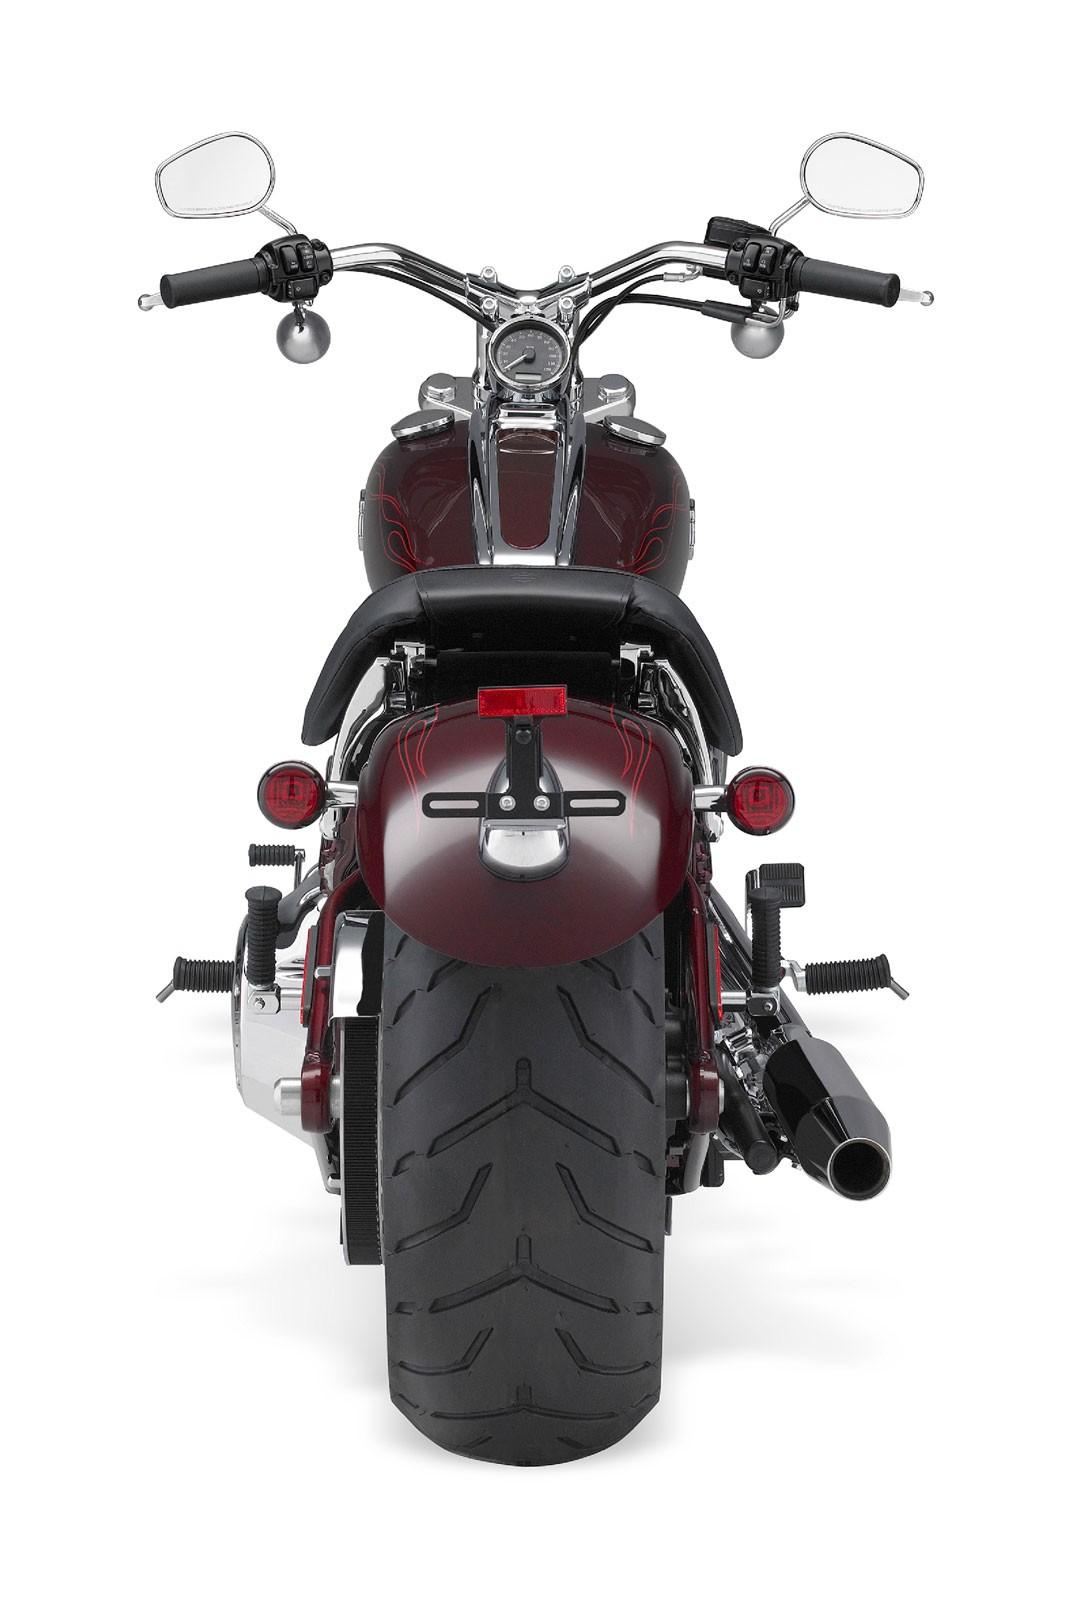 Harley Davidson Rocker C Specs - 2008  2009